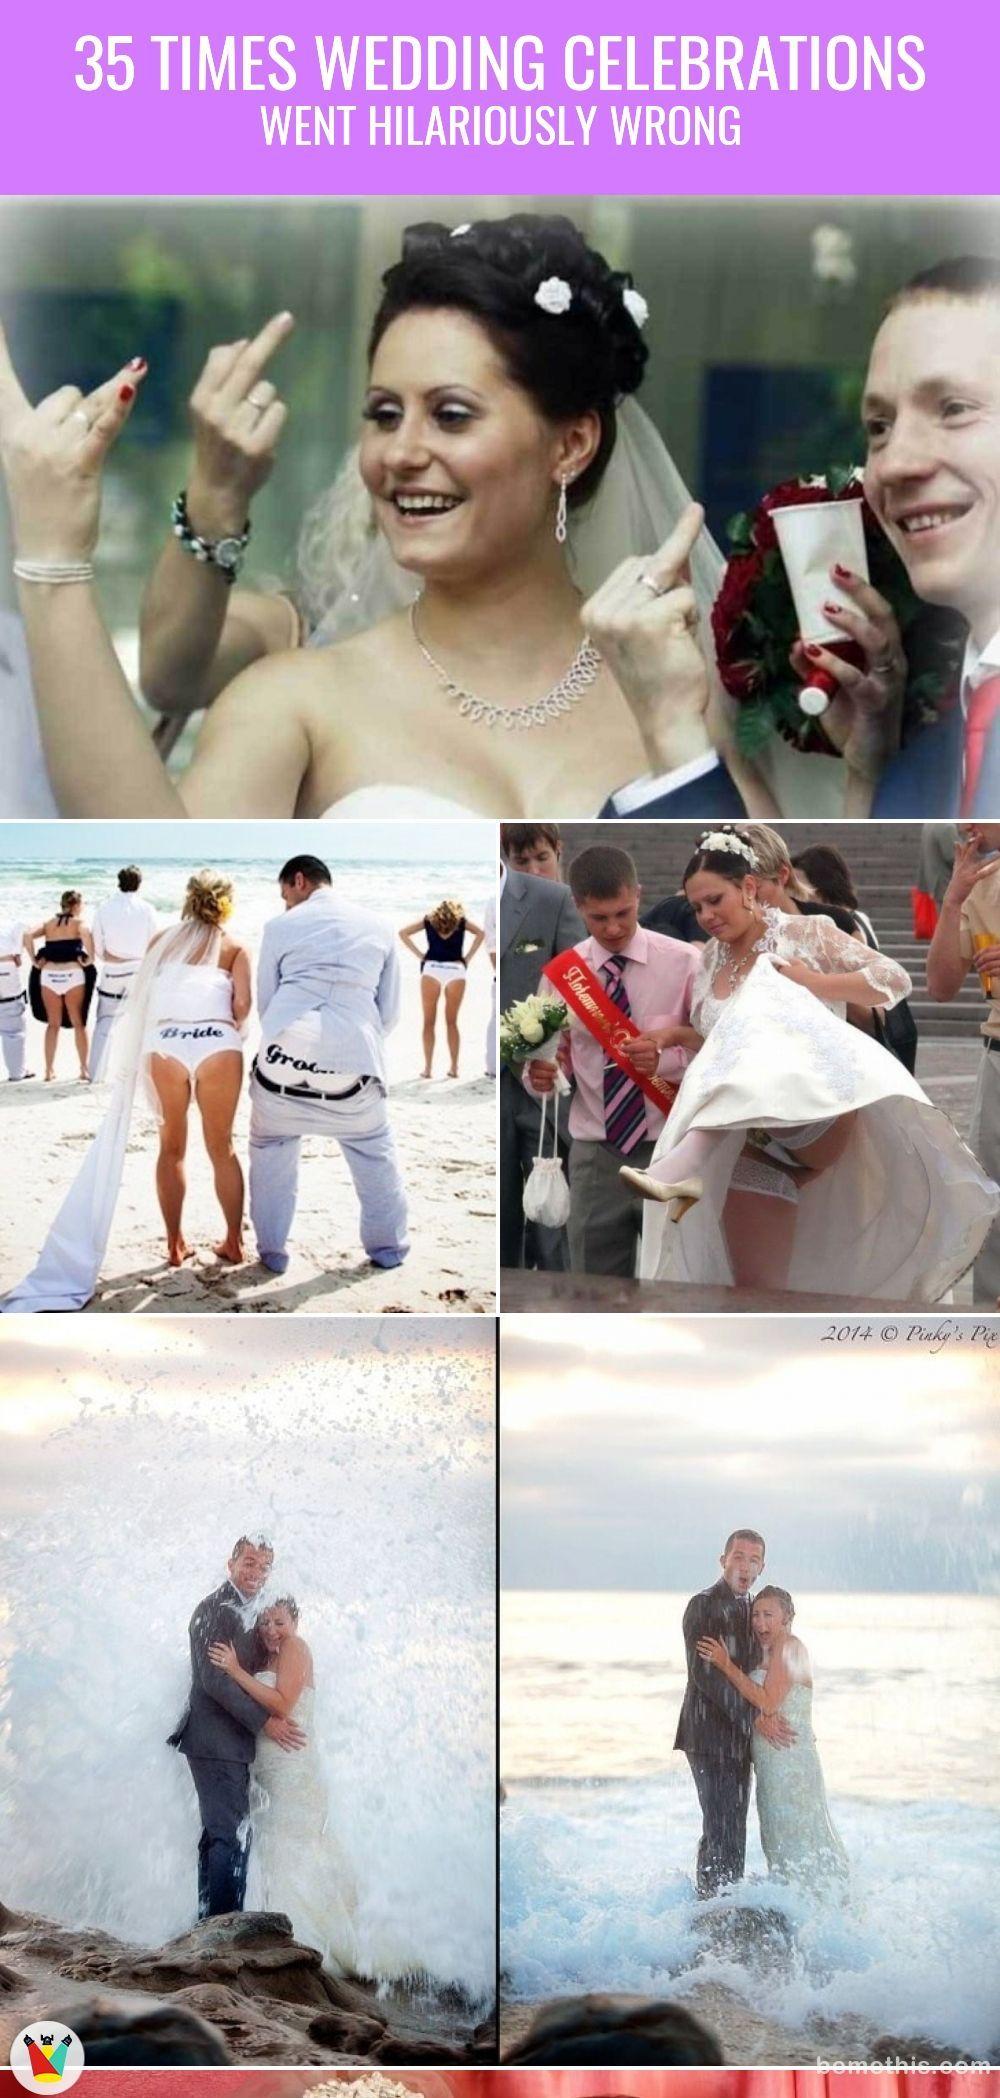 35 Times Wedding Celebrations Went Hilariously Wrong